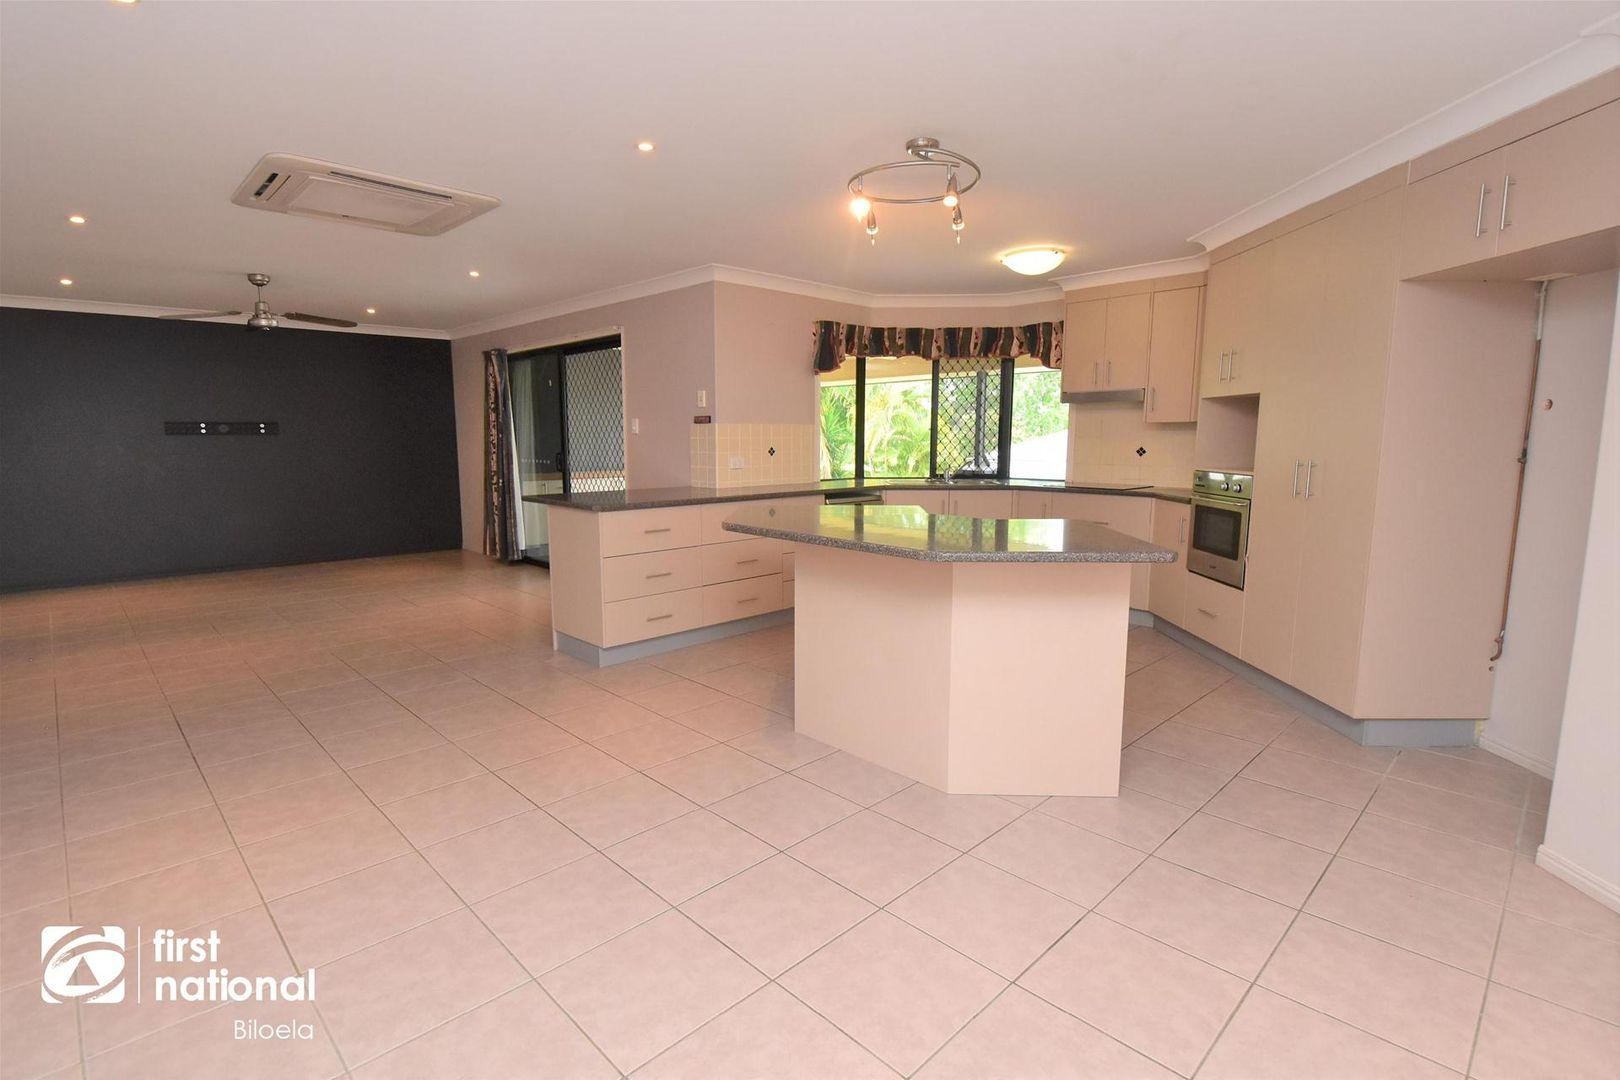 17 Michael Drive, Biloela QLD 4715, Image 2